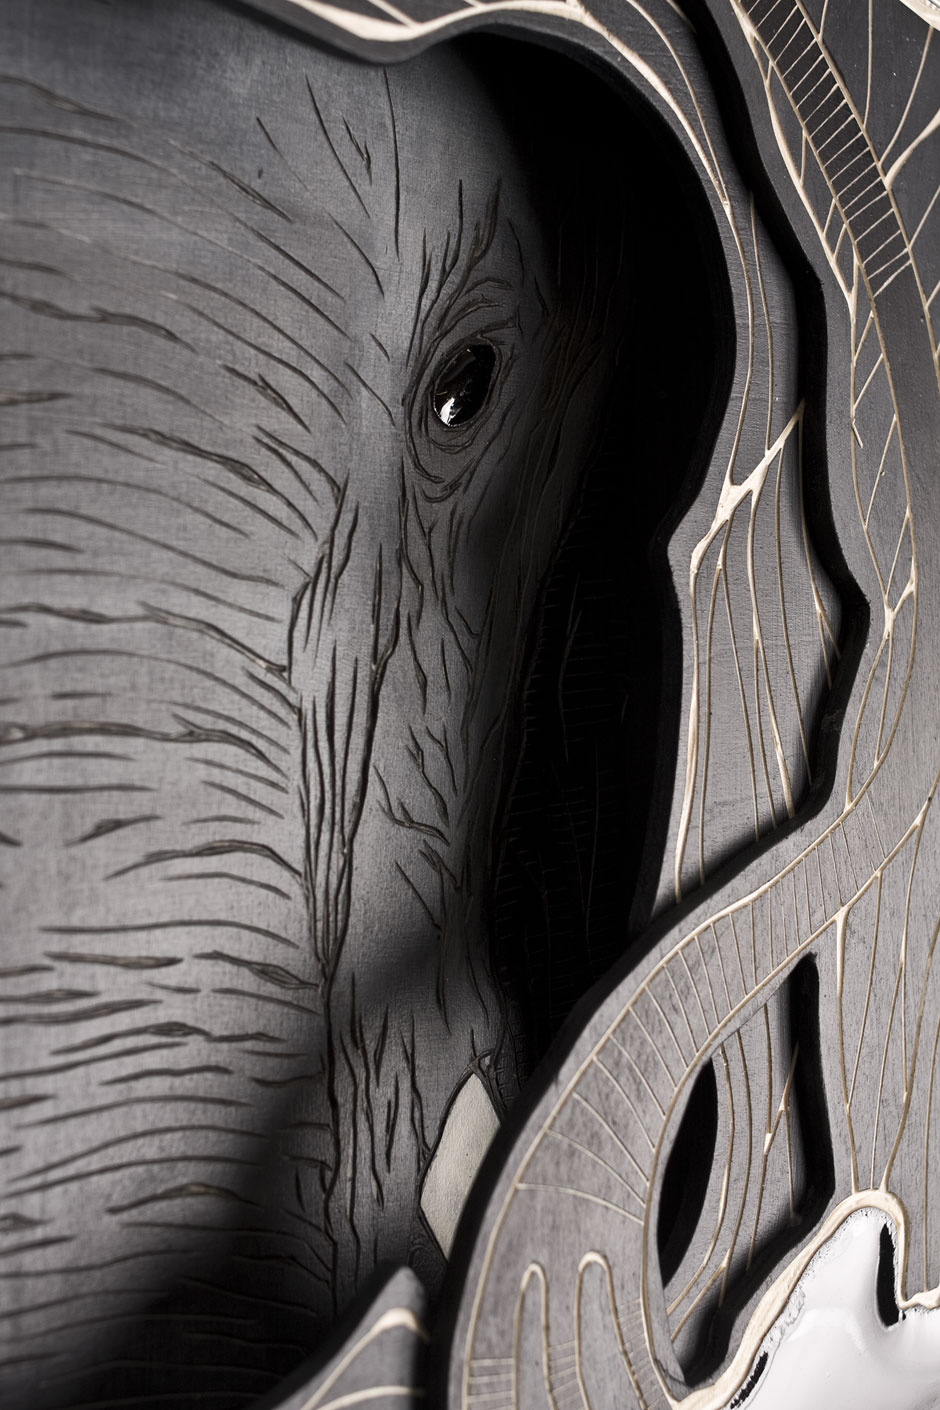 Detail from: Animal Inside (Masked Hero #02: Elephant) | © Alex Diamond